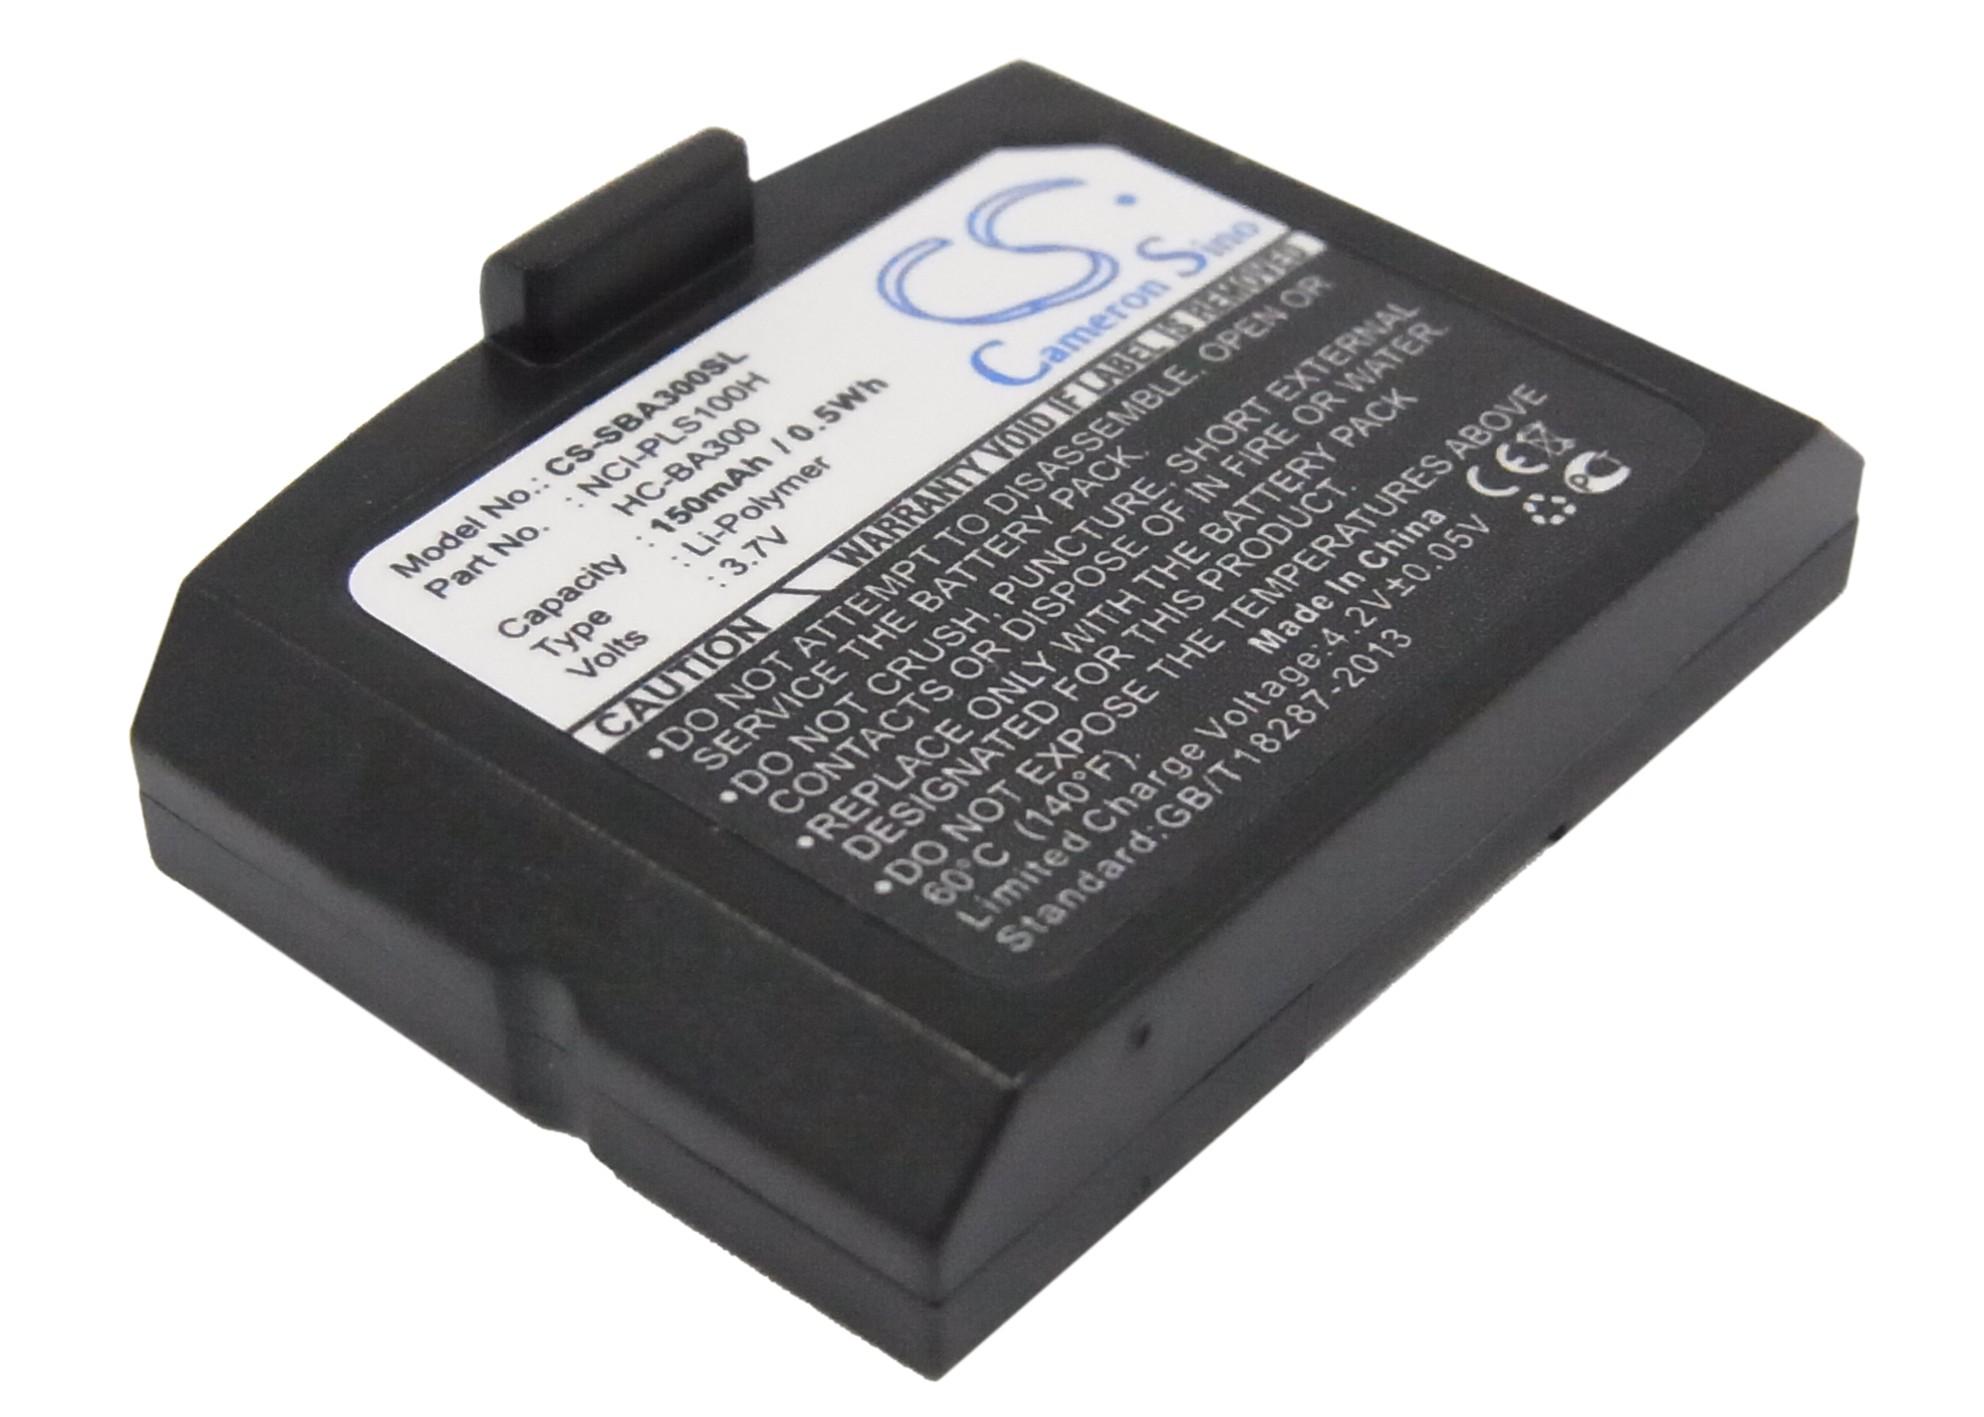 Cameron Sino baterie do bezdrátových sluchátek a headsetů pro SENNHEISER RS 4200 TV-2 3.7V Li-Polymer 150mAh černá - neoriginální